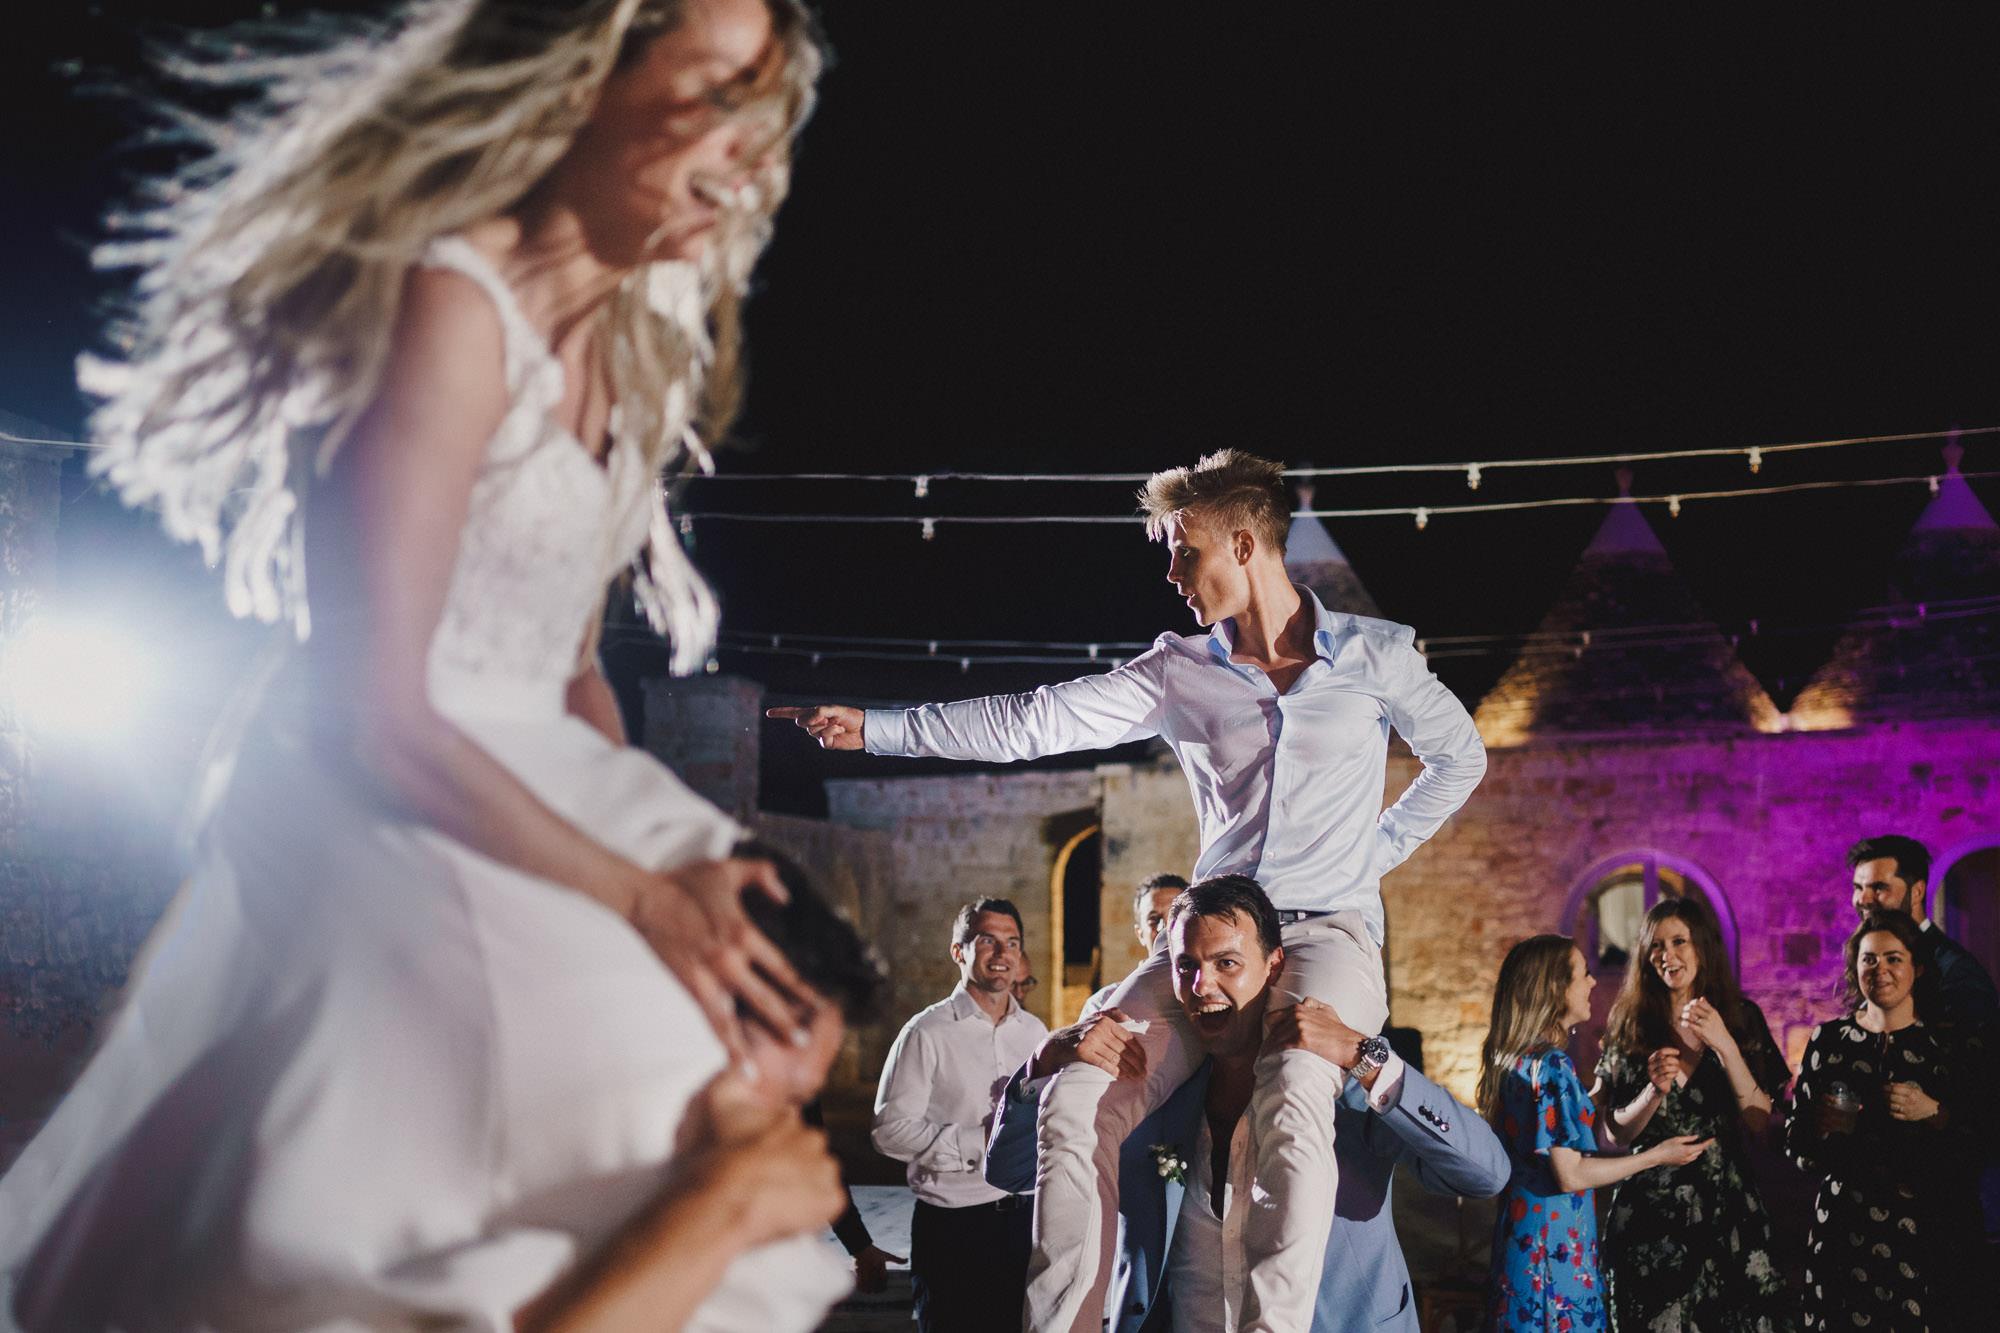 Puliga Wedding Photographer